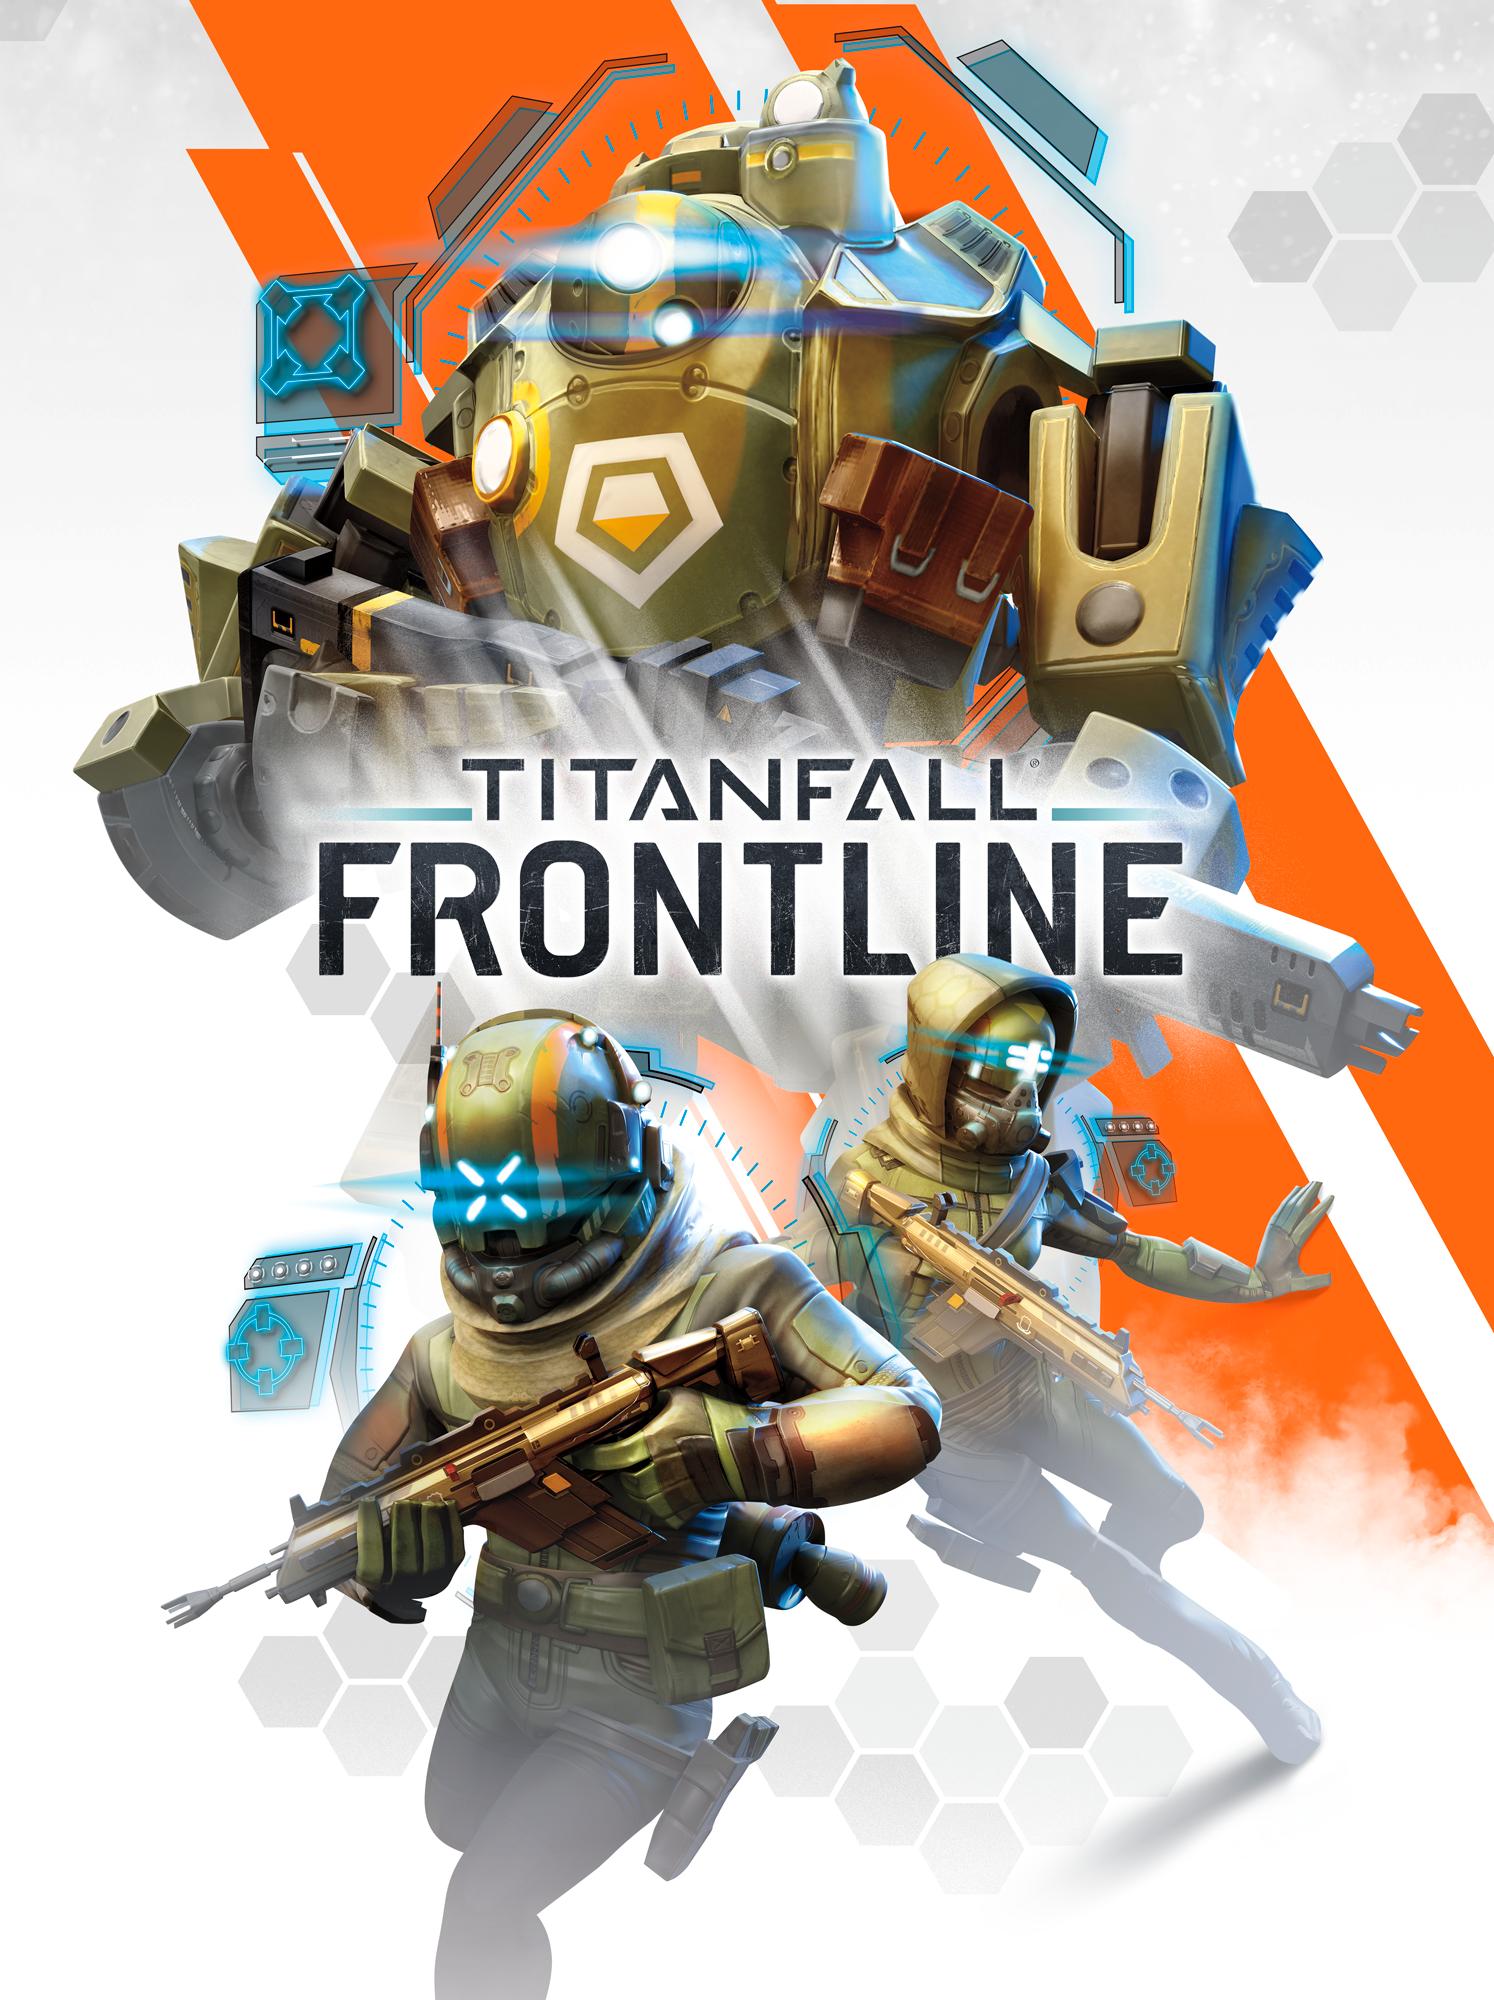 PS4 Titanfall 2 Frontline